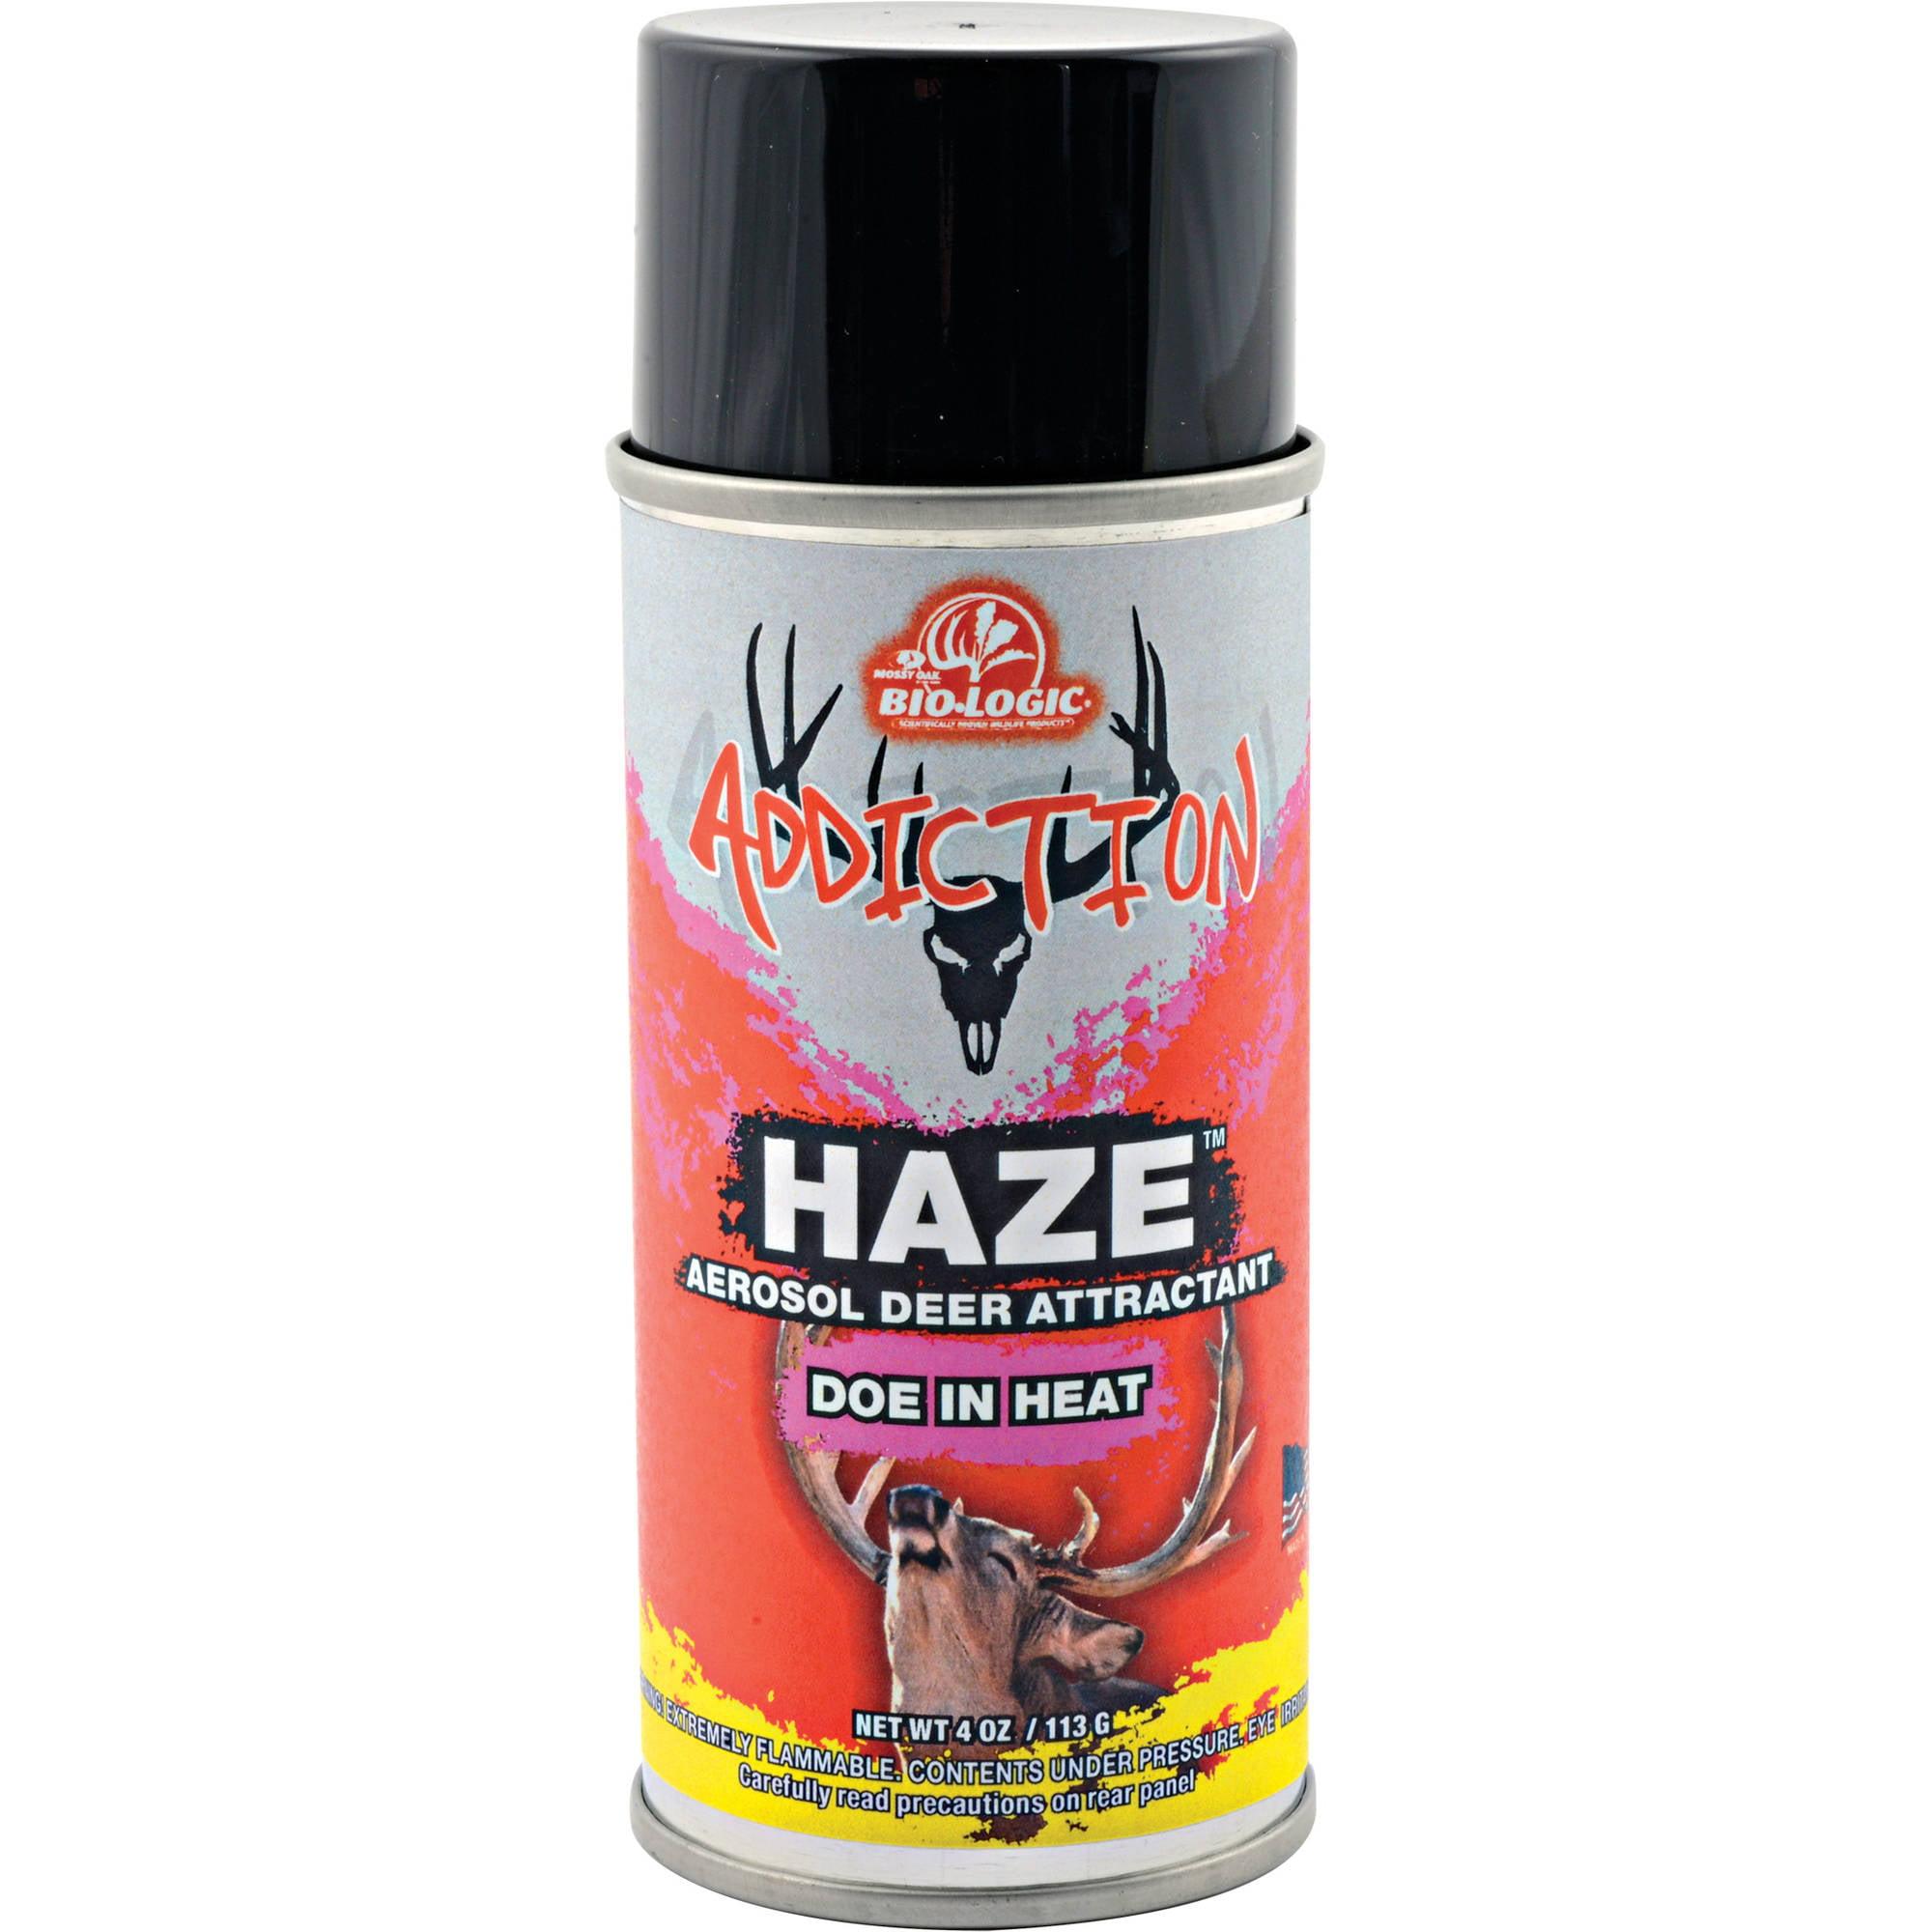 Mossy Oak BioLogic Addiction Haze 4-Ounce Aerosol Doe In Heat